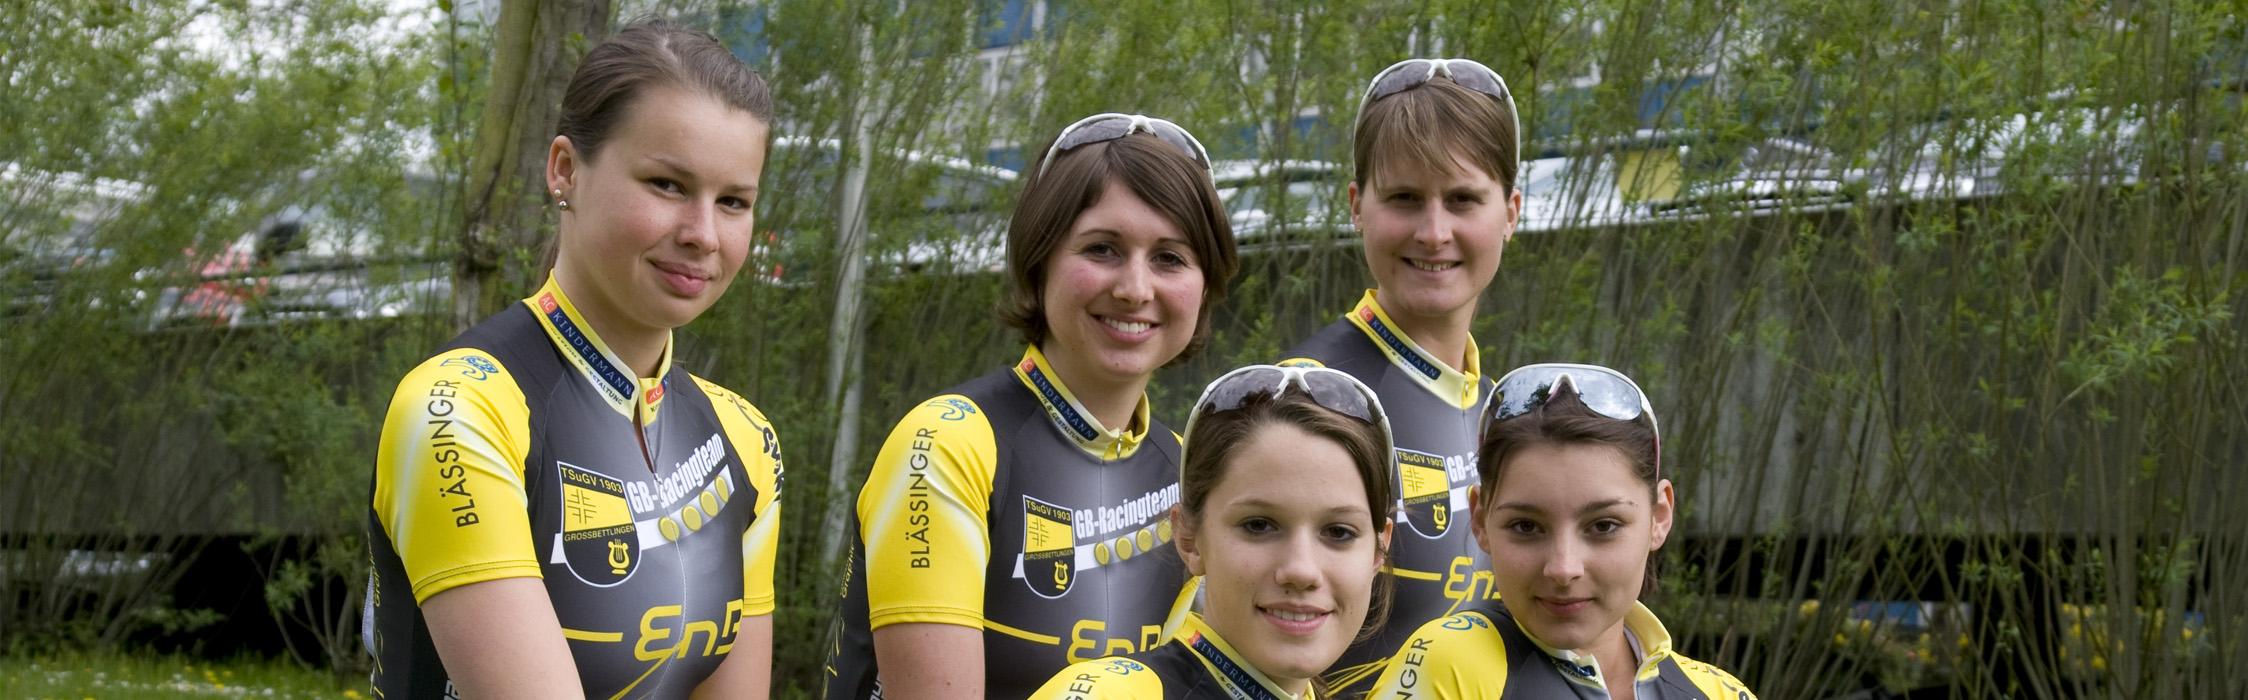 GB-Racingteam